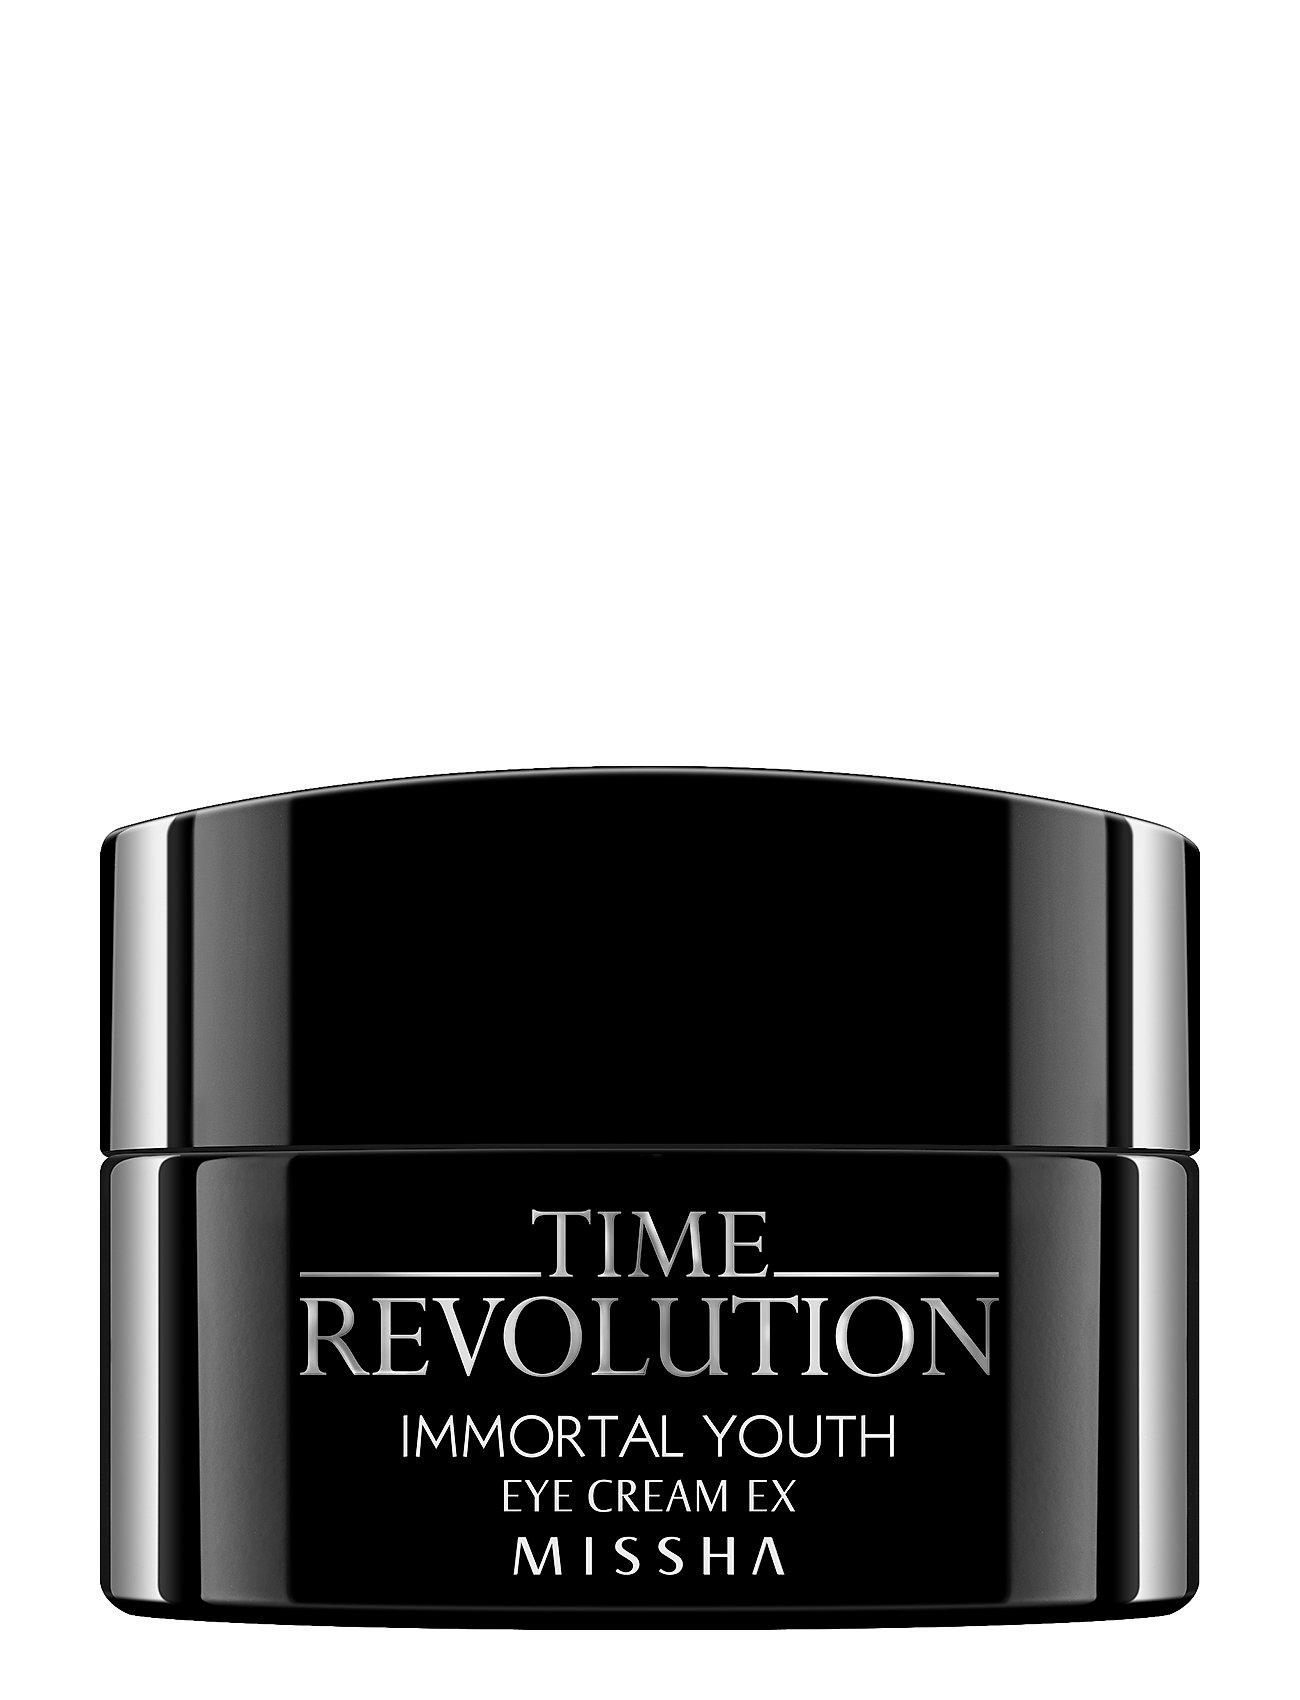 Missha Missha Time Revolution Immortal Youth  Eye Cream EX - CLEAR